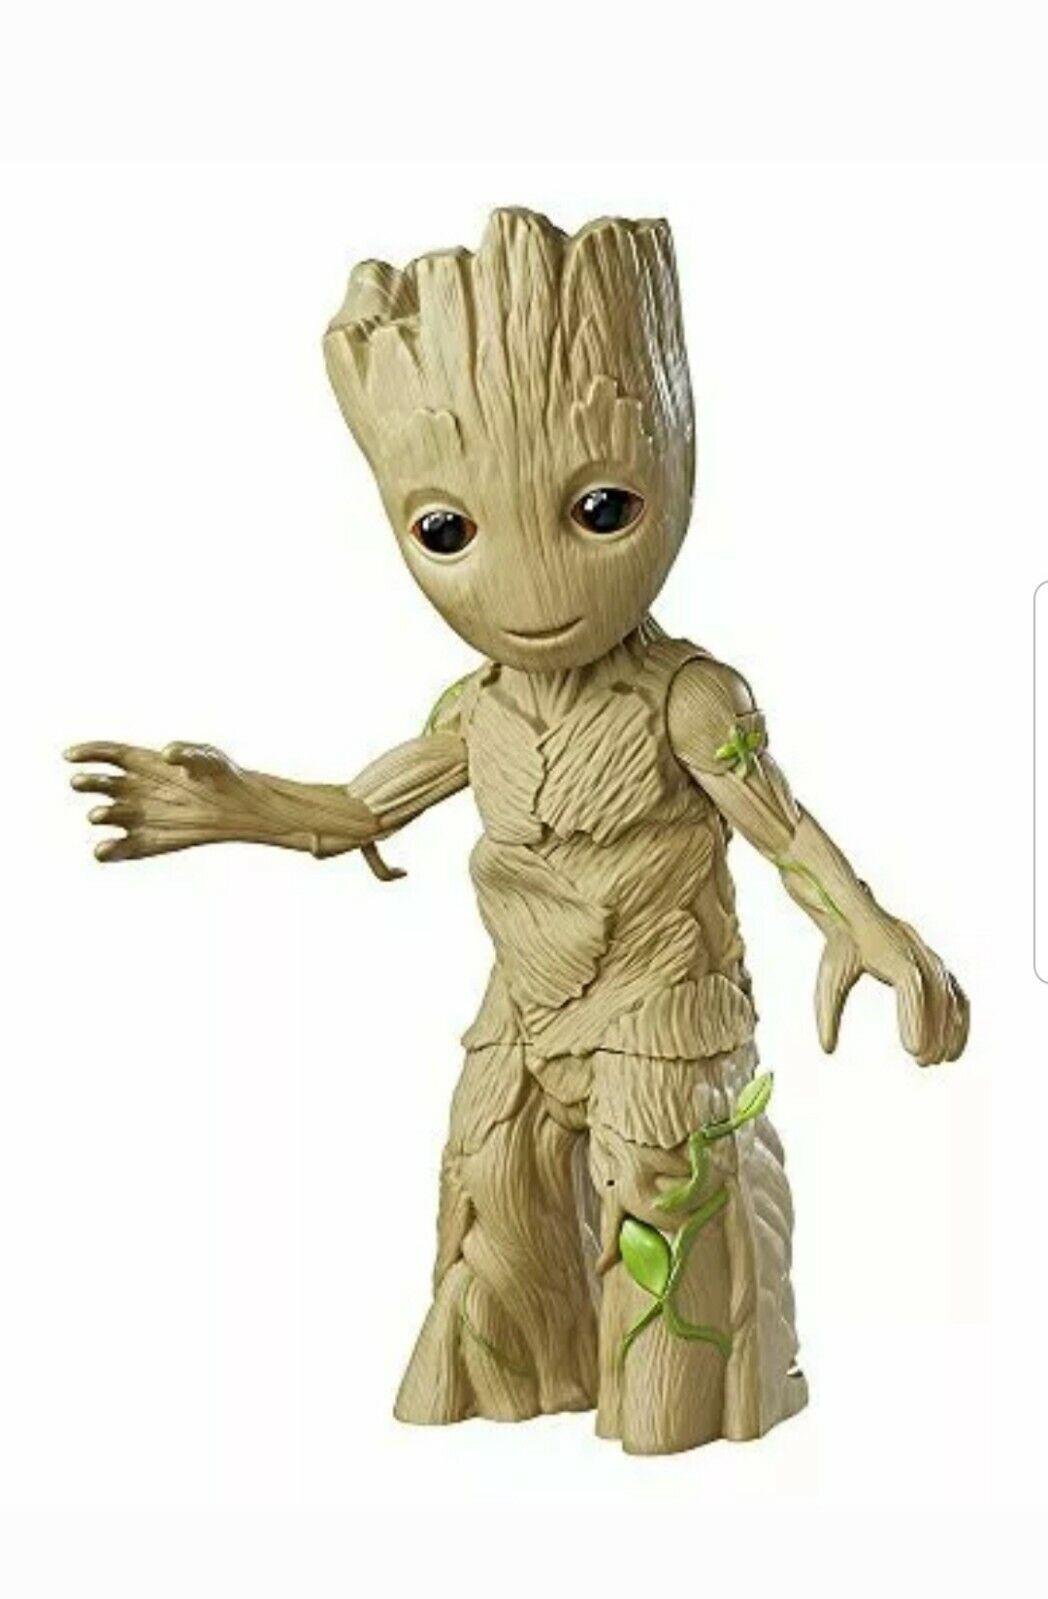 Marvel Guardiani della Galassia VOL 2 Dancing Groot Figura 29cm